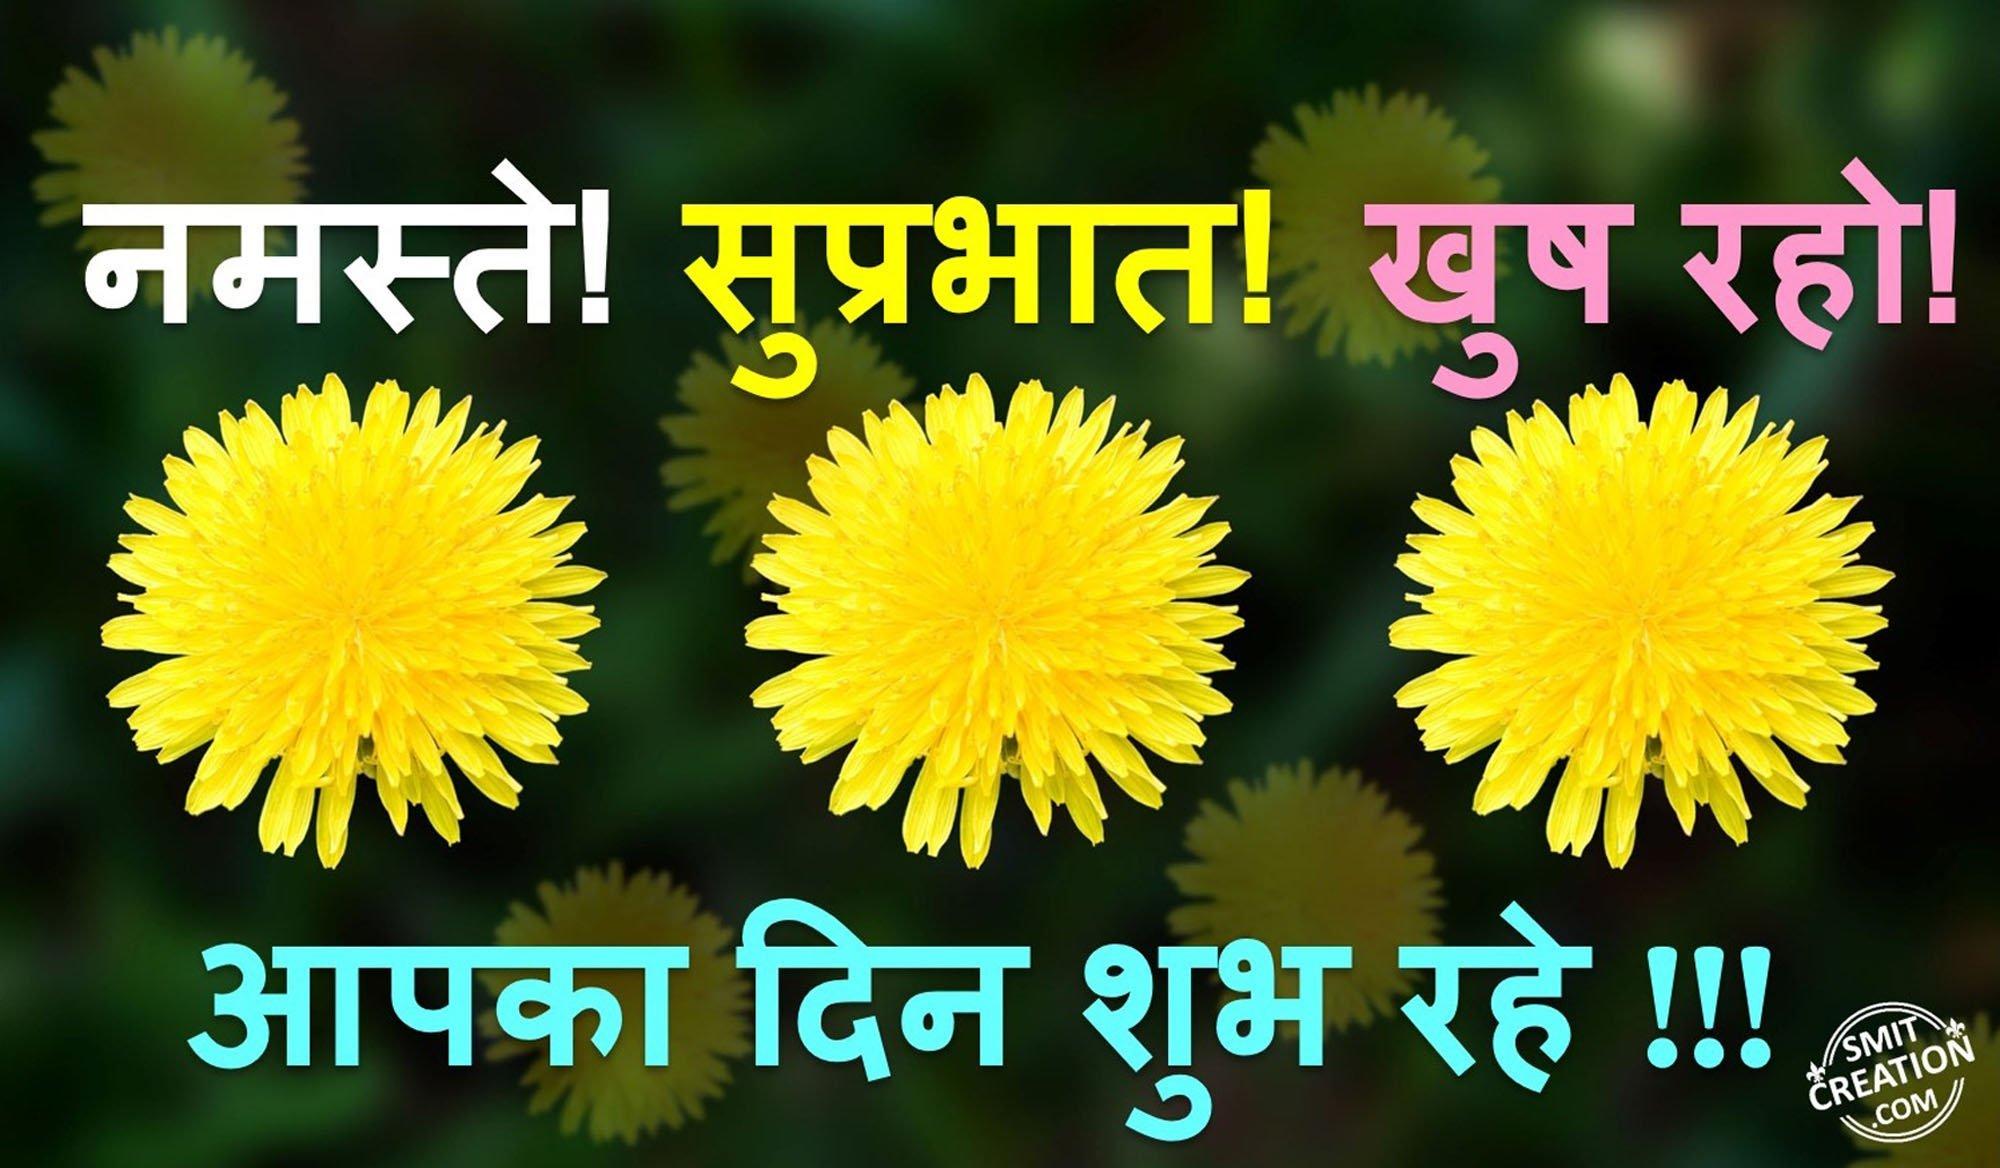 Suprabhat Hindi Images सपरभत हद इमजस